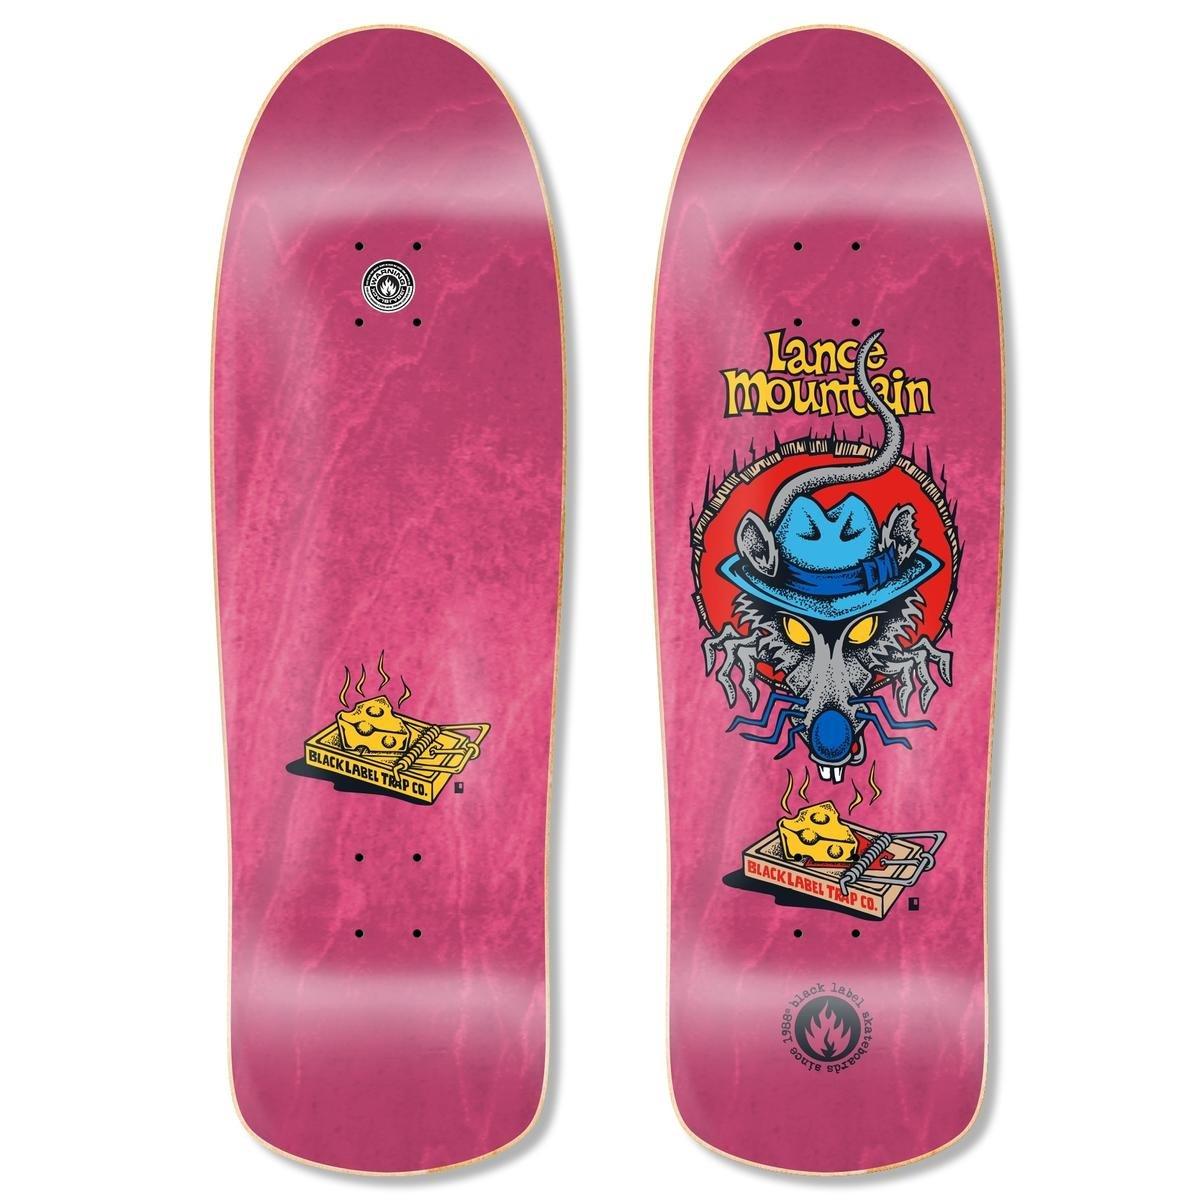 Black Label Lance Mountain Rat Trap pink 10 x 32.25